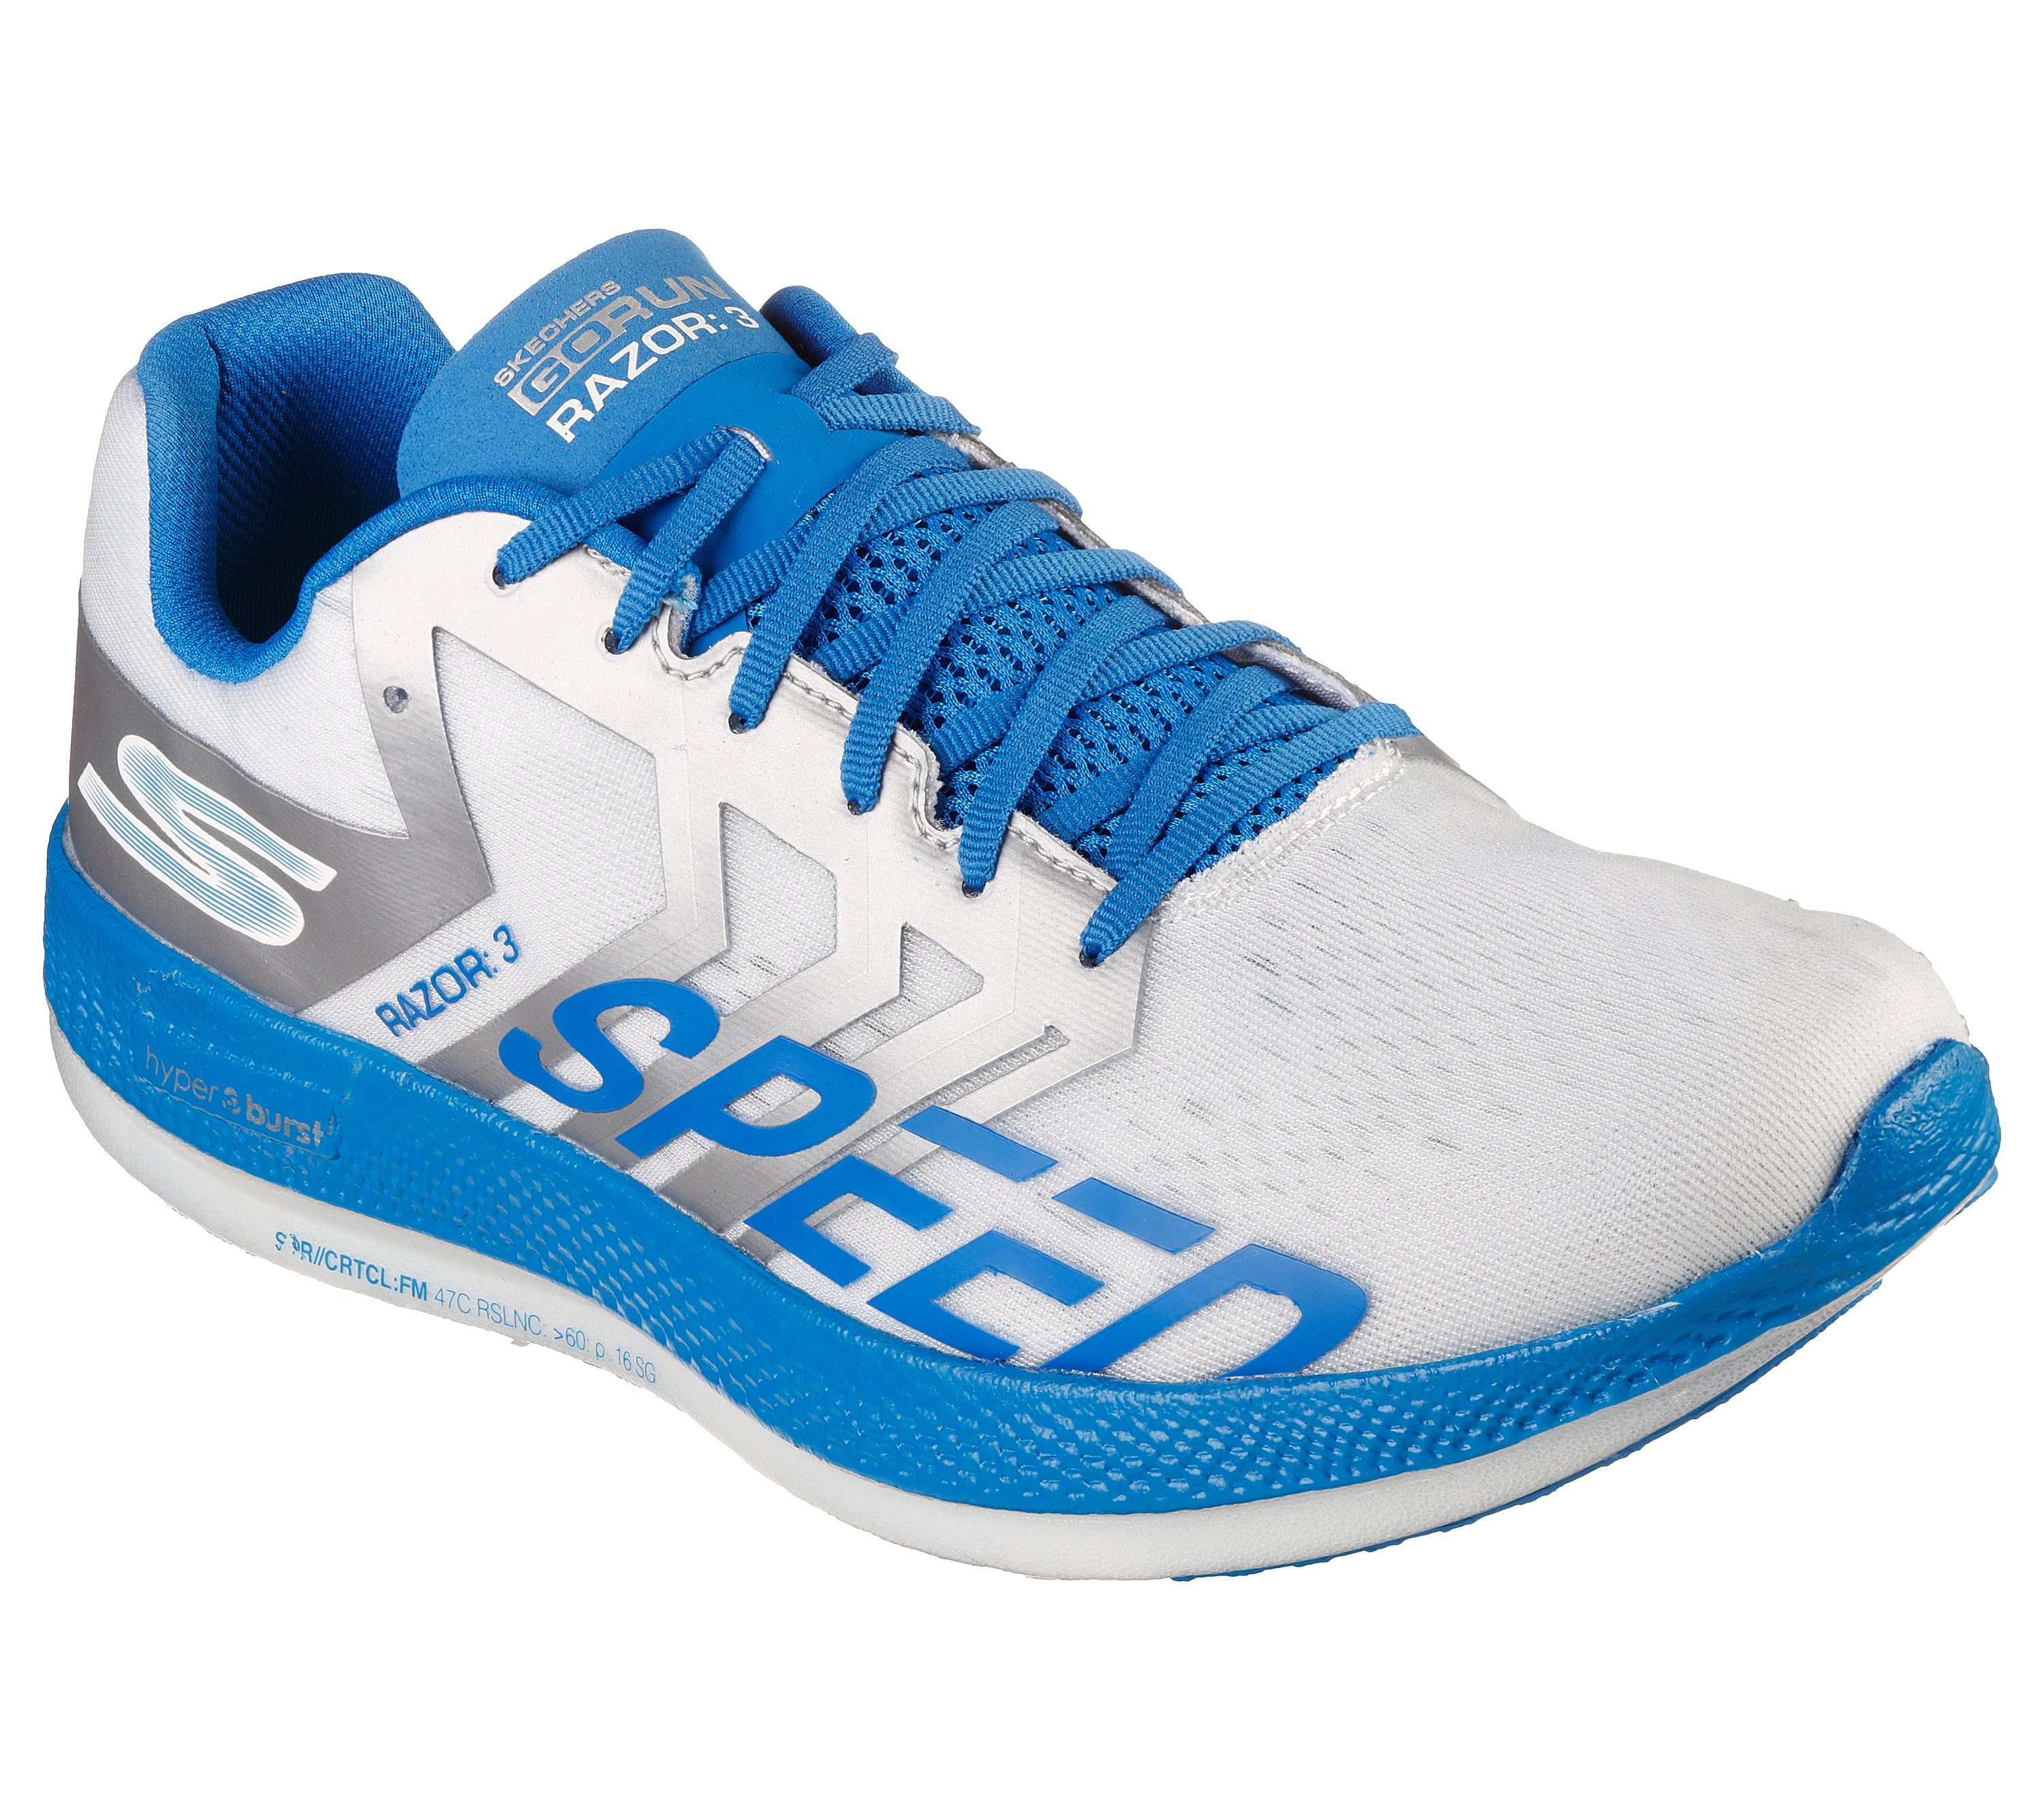 skechers runners